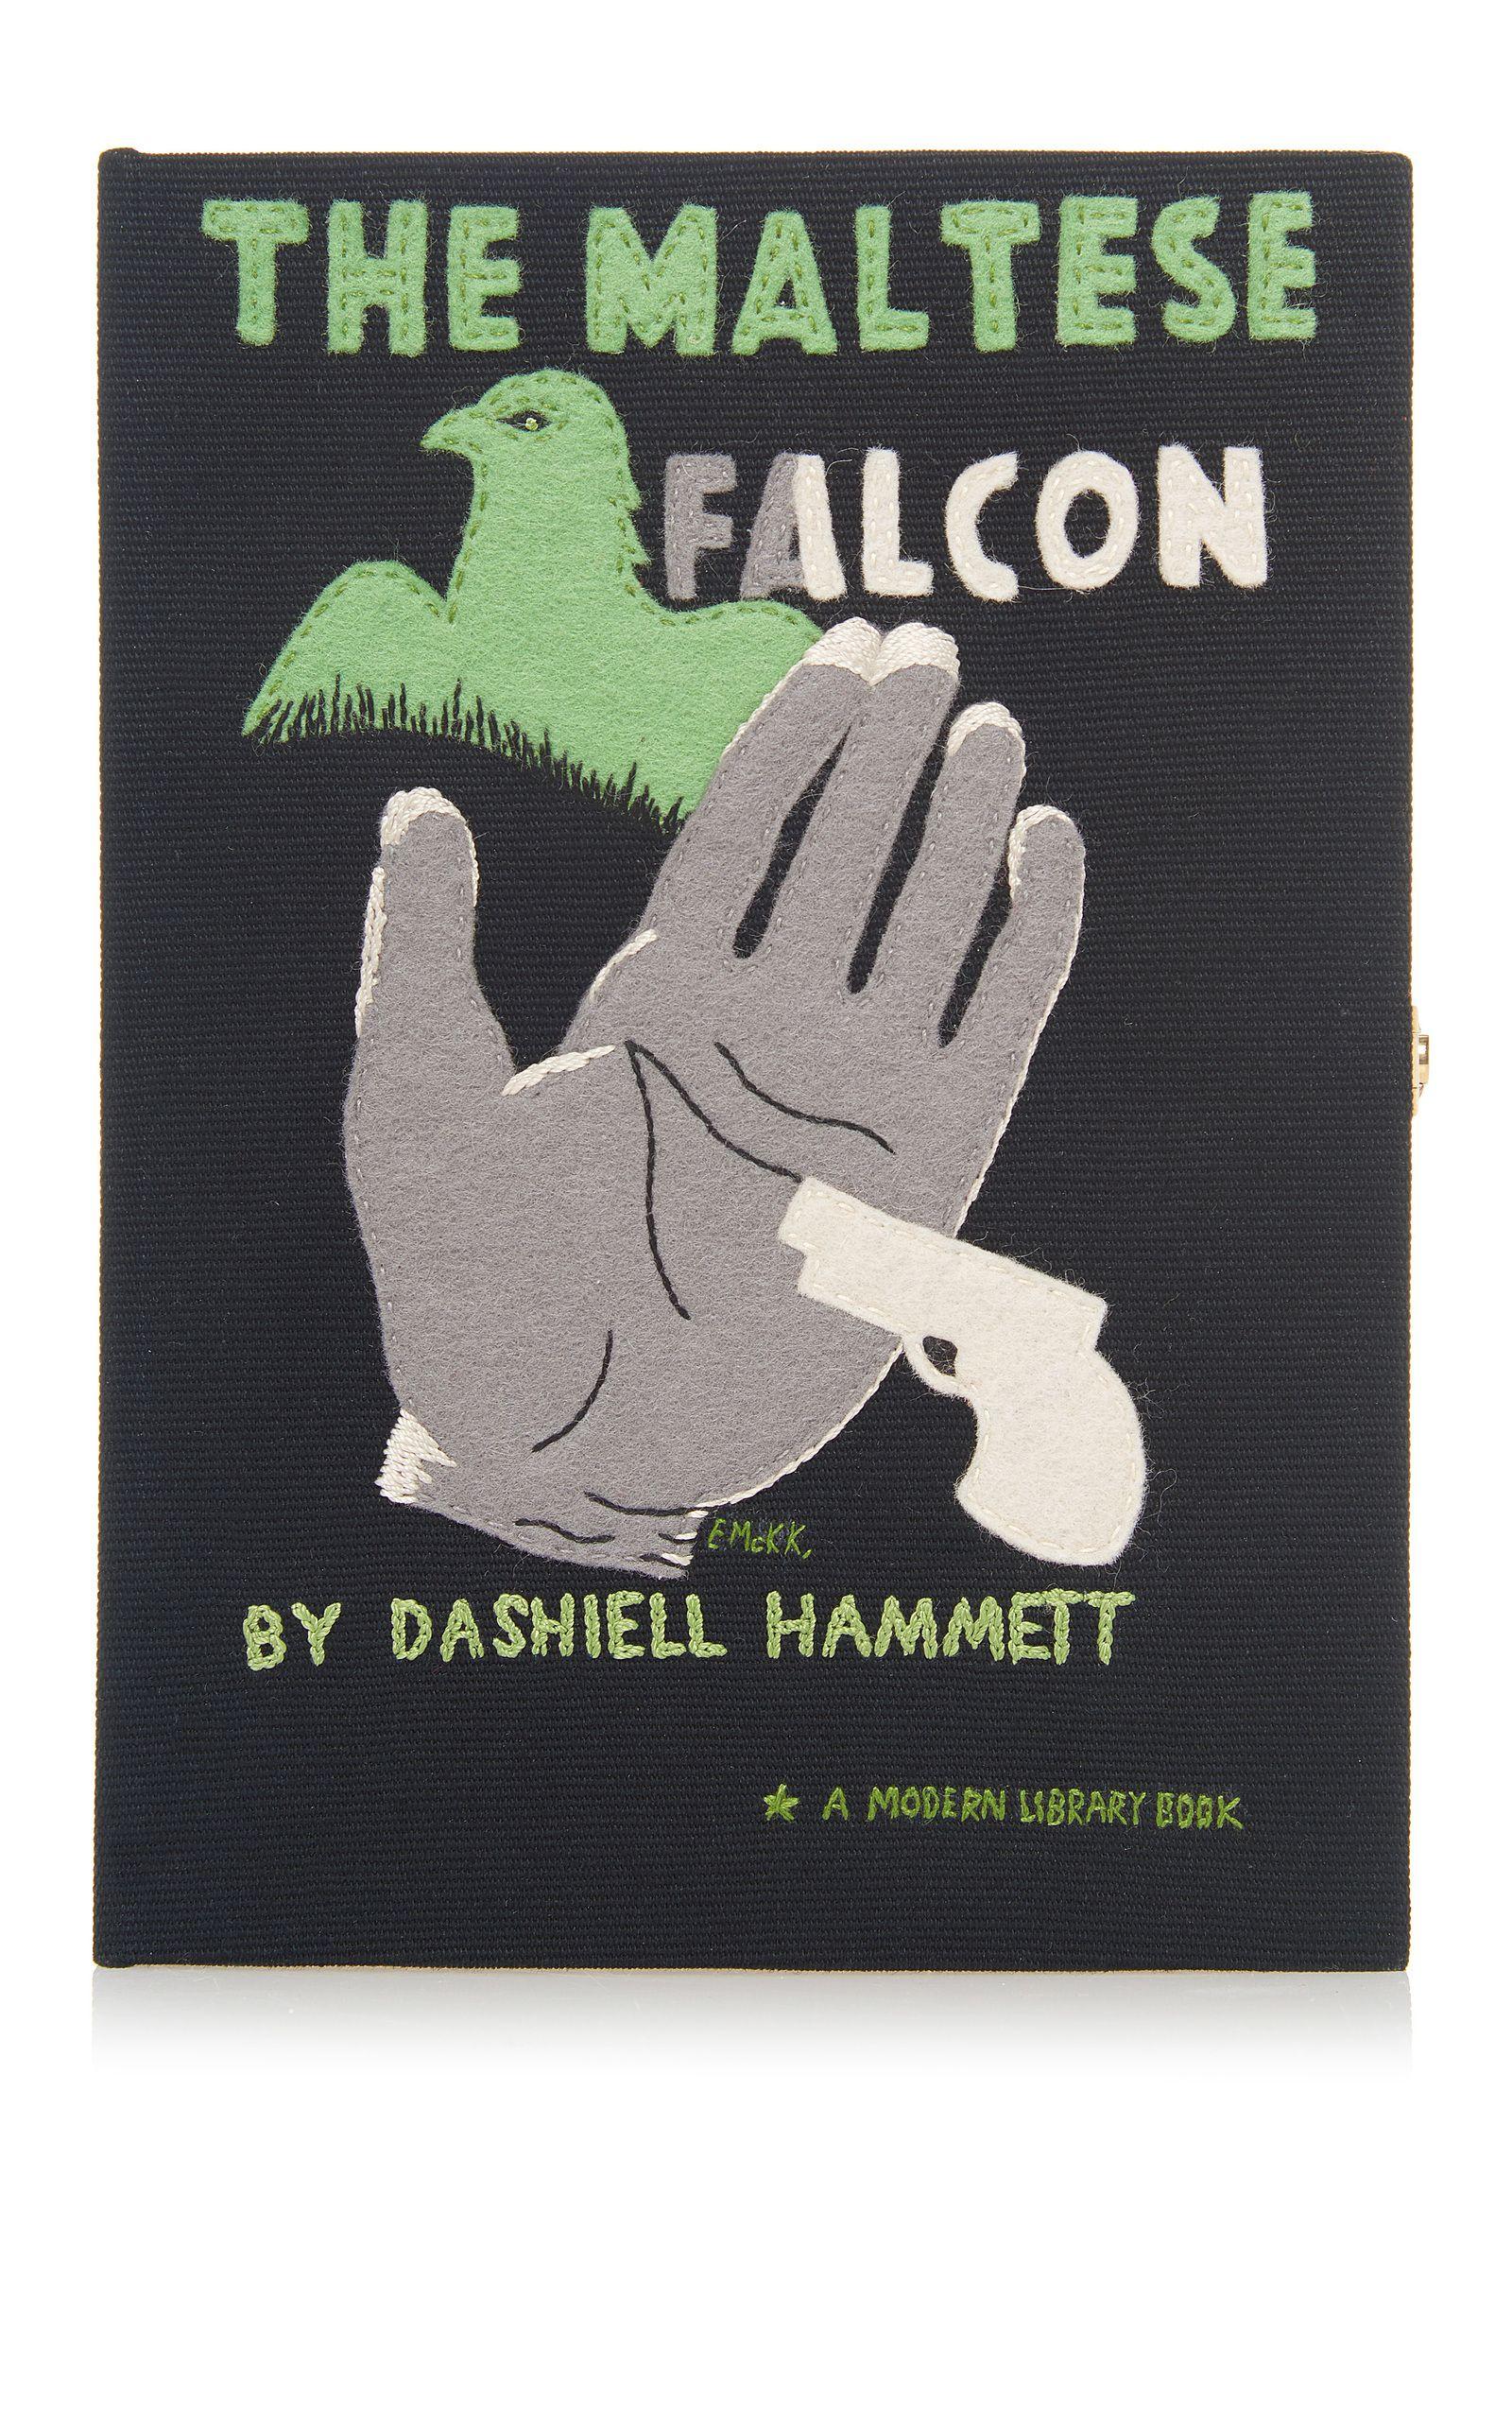 Olympia Le Tan The Maltese Falcon Book Clutch The Maltese Falcon Book Book Clutch Olympia Le Tan